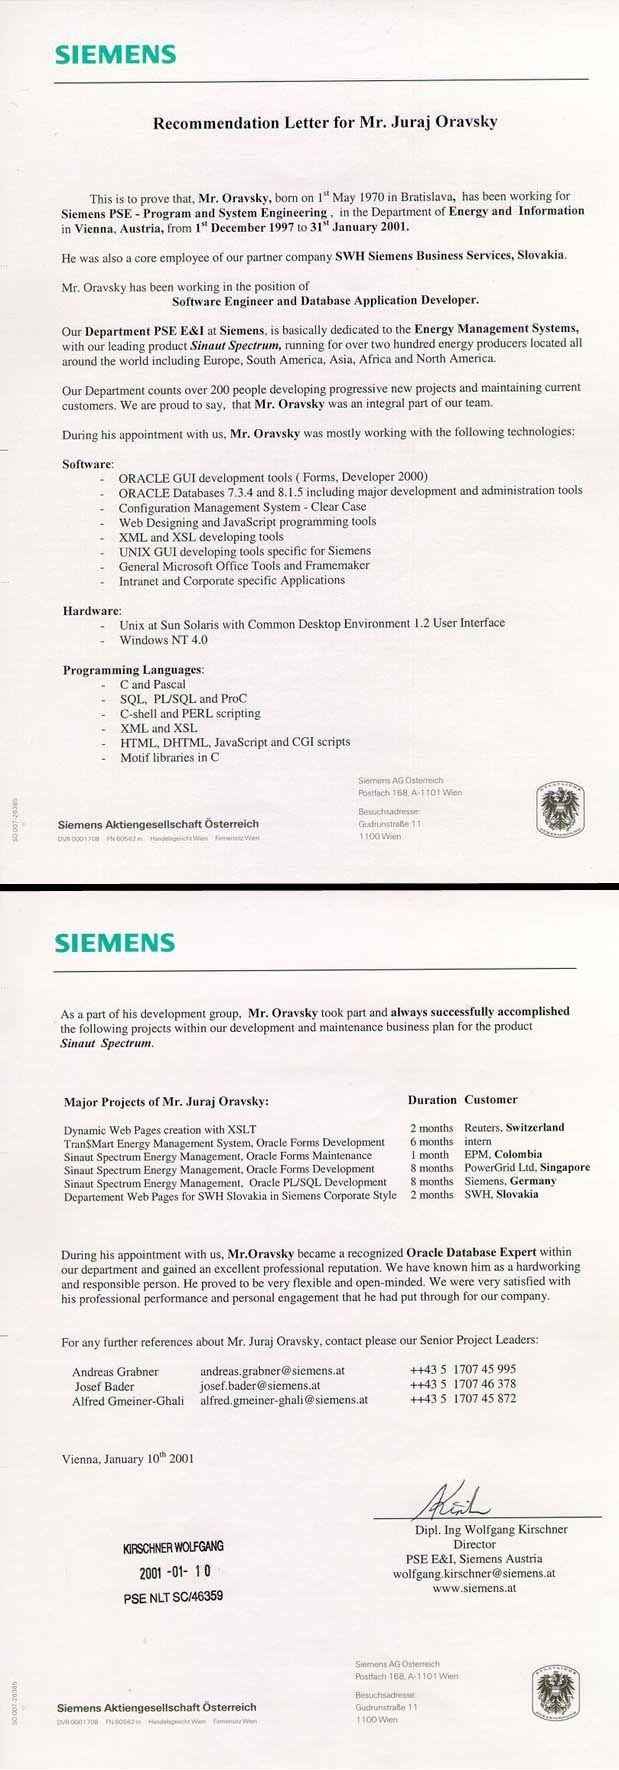 Webload Performance Tester Cover Letter Free Business Lease Date Siemens  Letterhtml